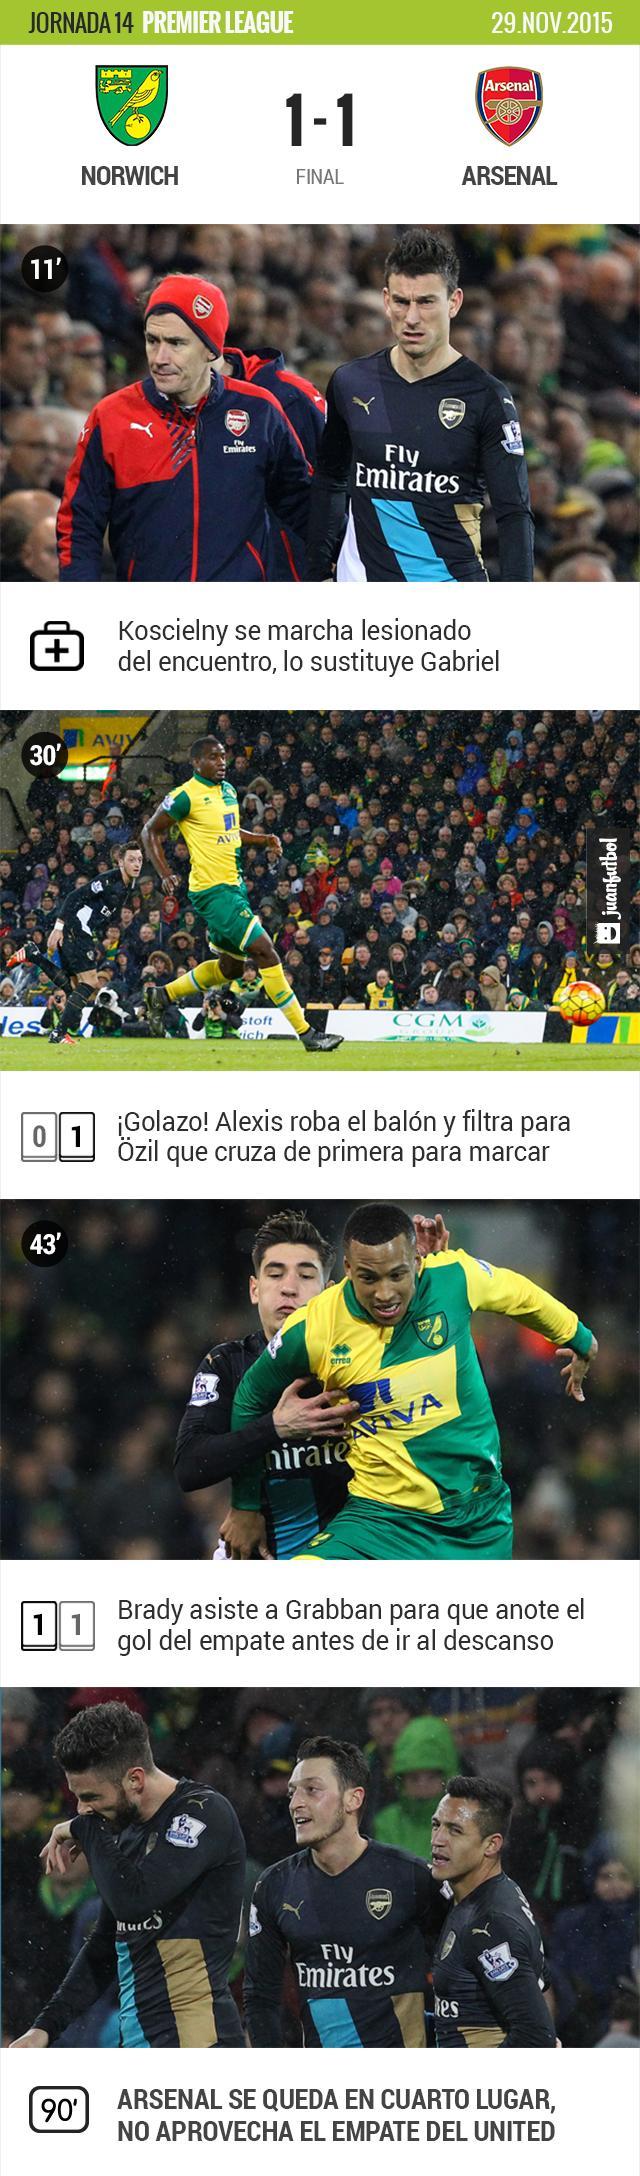 Norwich 1-1 Arsenal